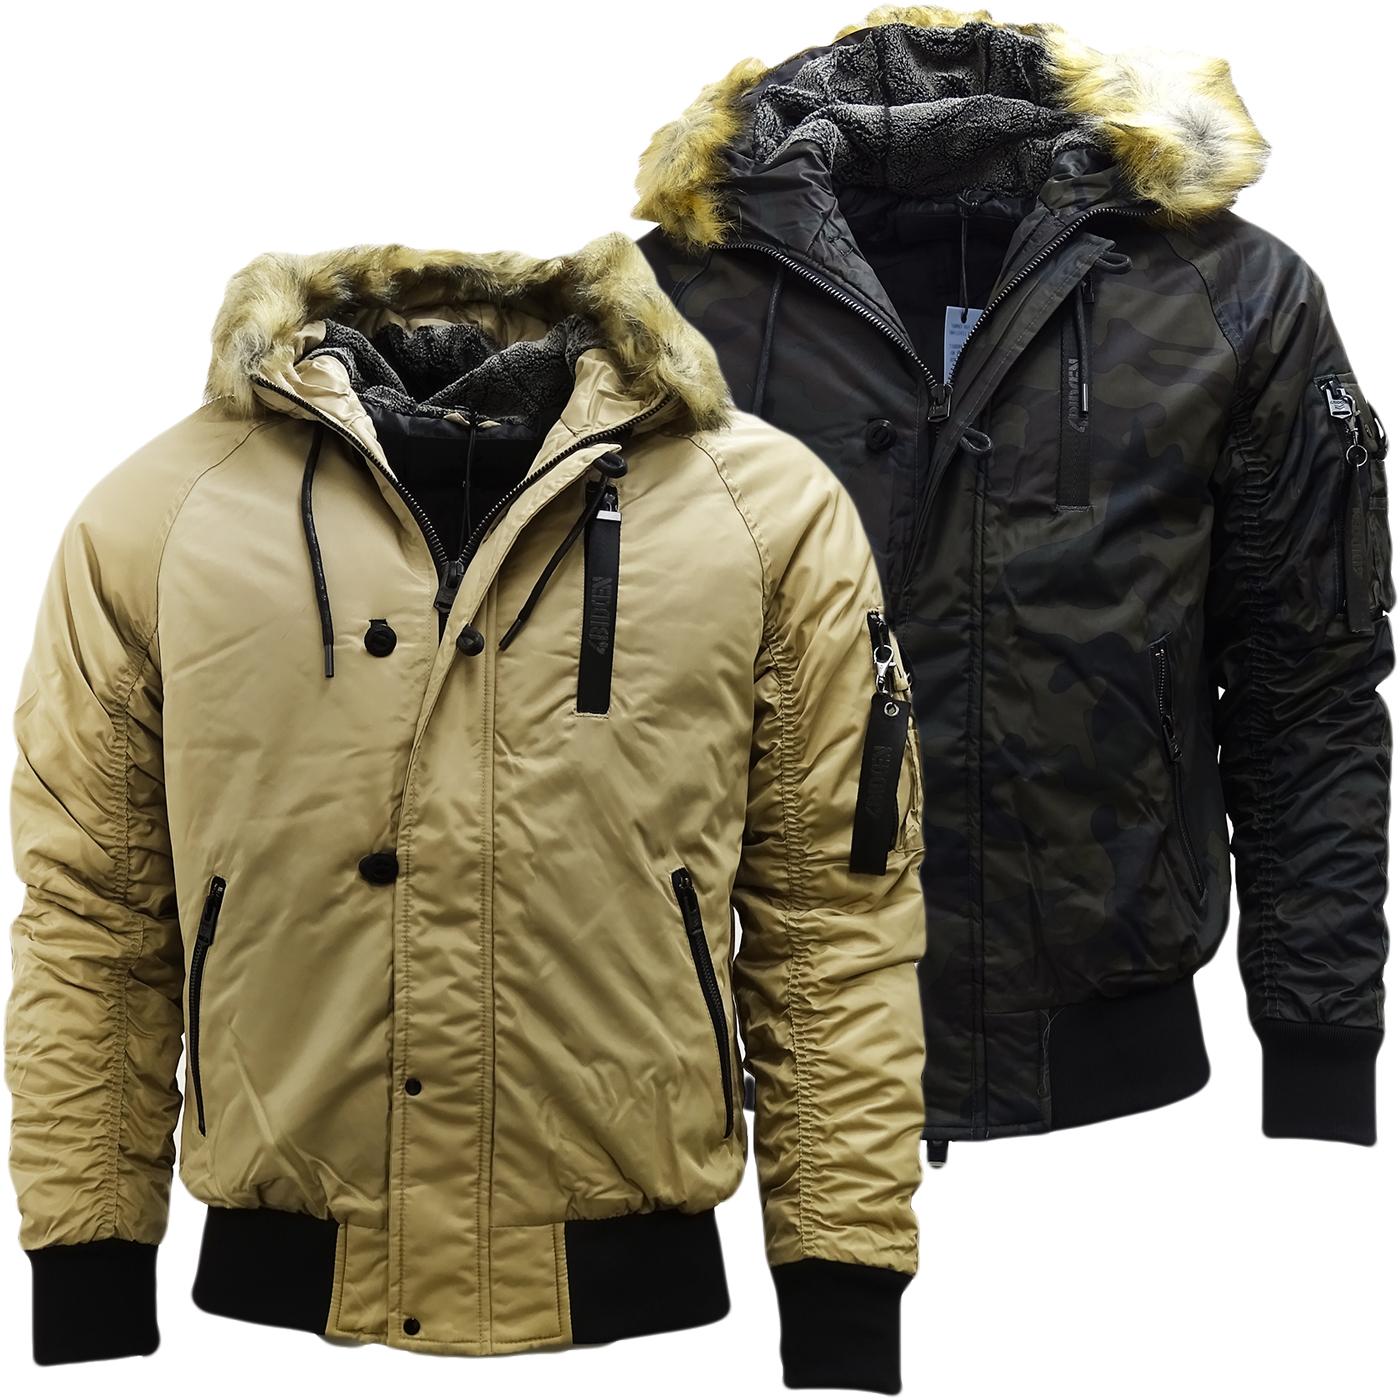 4Bidden Faux Fur Hooded Bomber Jacket / Outerwear Coat - Response